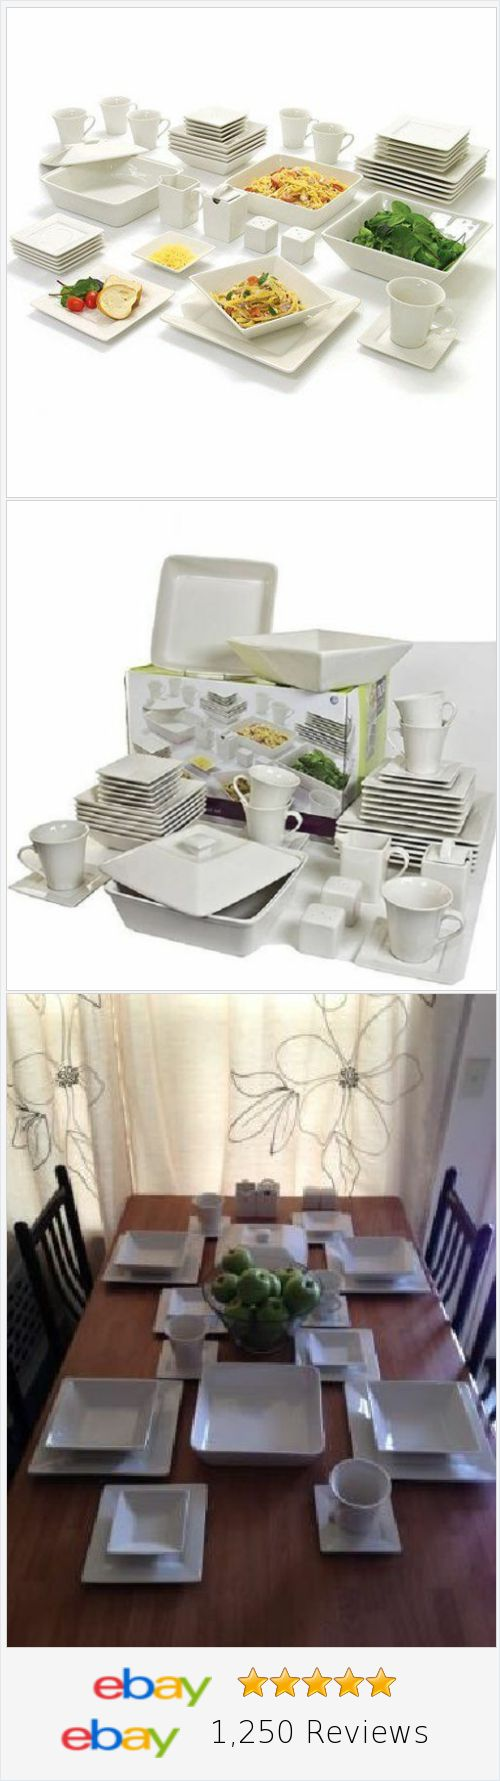 45 Piece White Dinnerware Set Square Banquet Plates Dishes Bowls ...